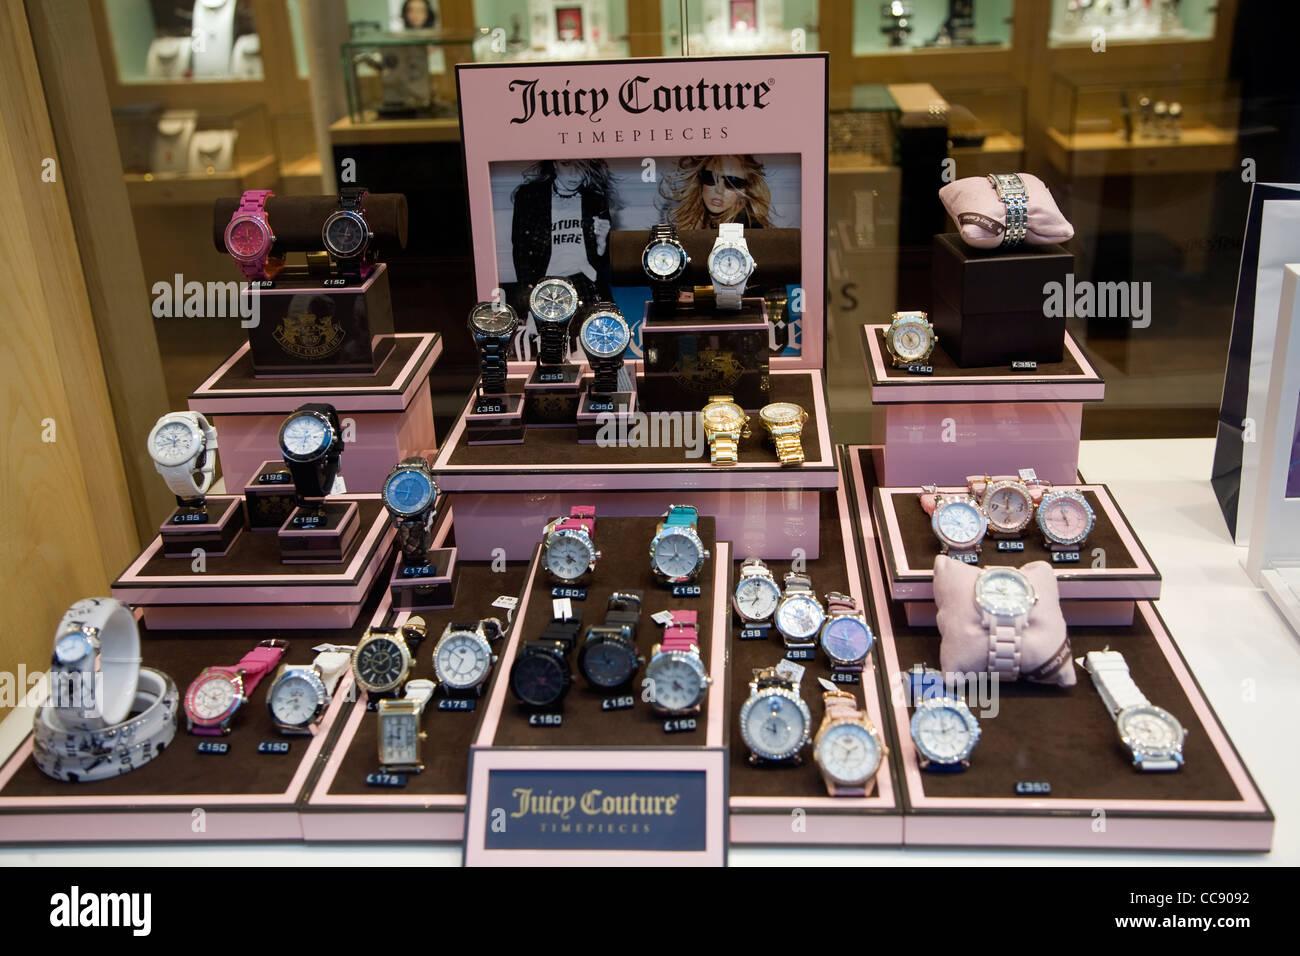 Montre Juicy Couture vitrine d'affichage Photo Stock